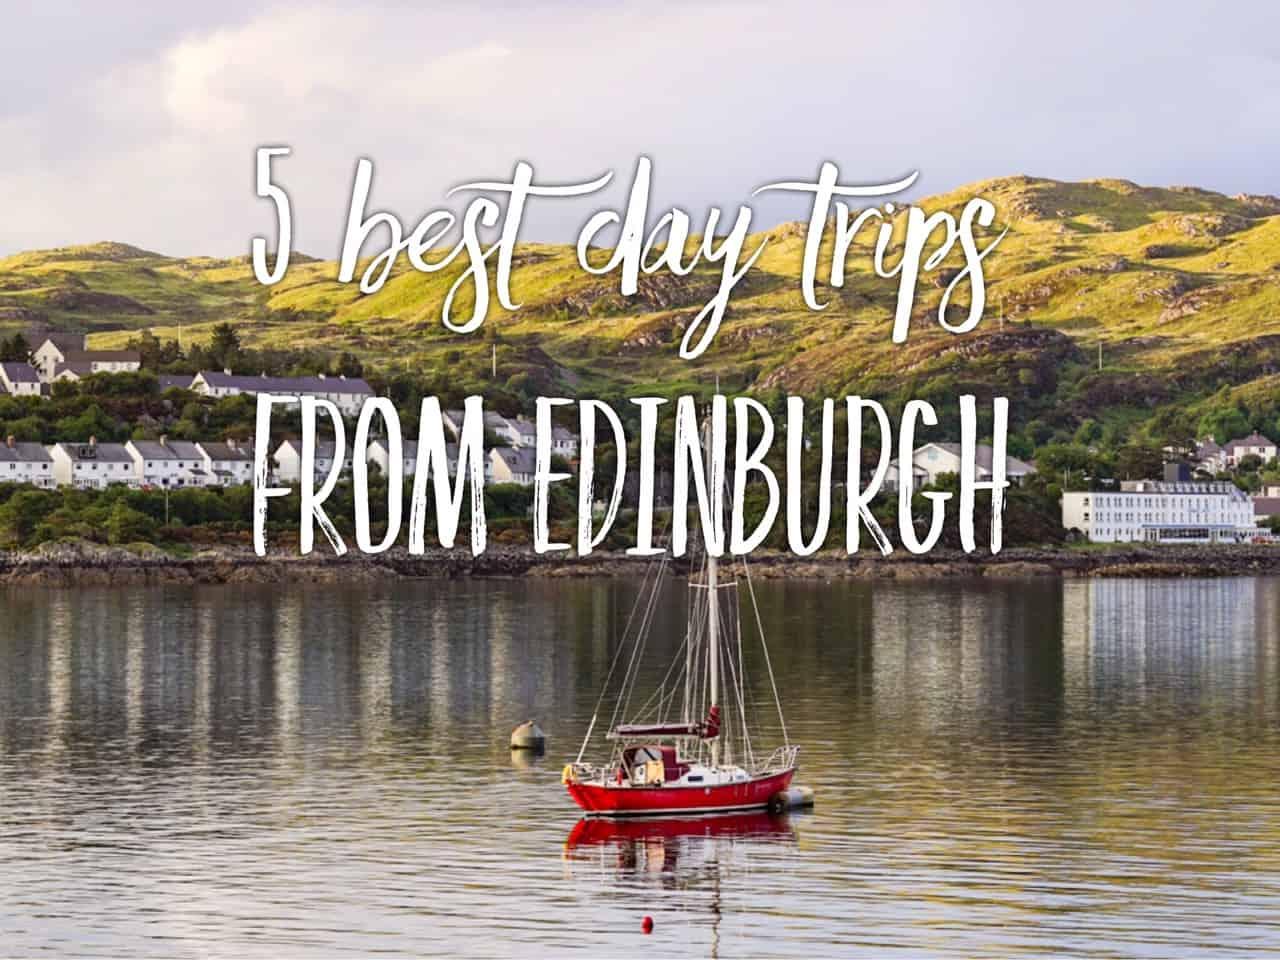 5 best day trips from Edinburgh, Scotland